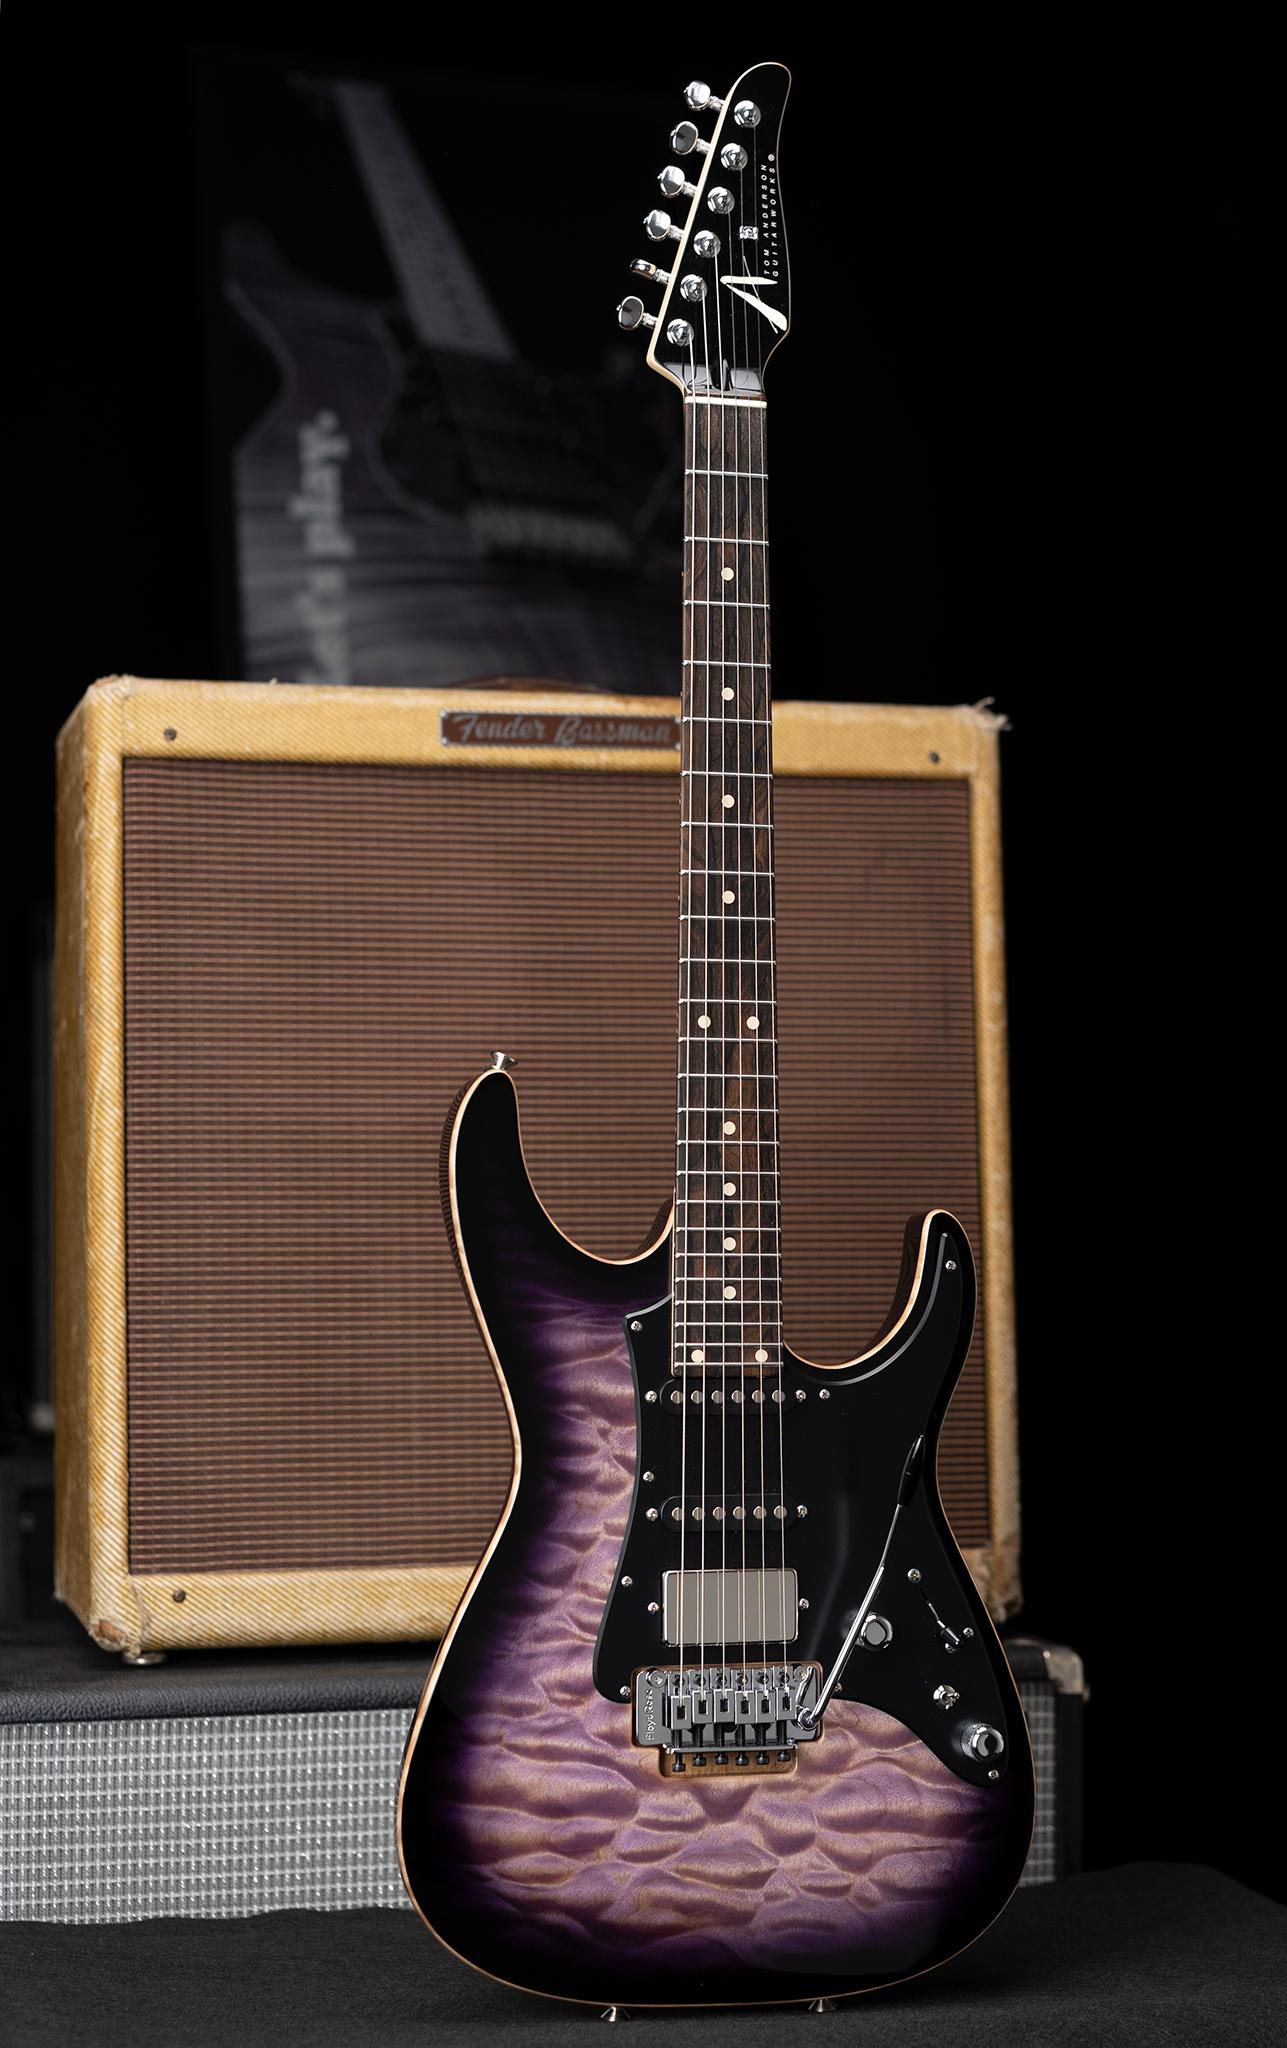 01-11-19P_fup_Guardian Angel_Natural Purple to T-Purple to Black Burst_2048.jpg